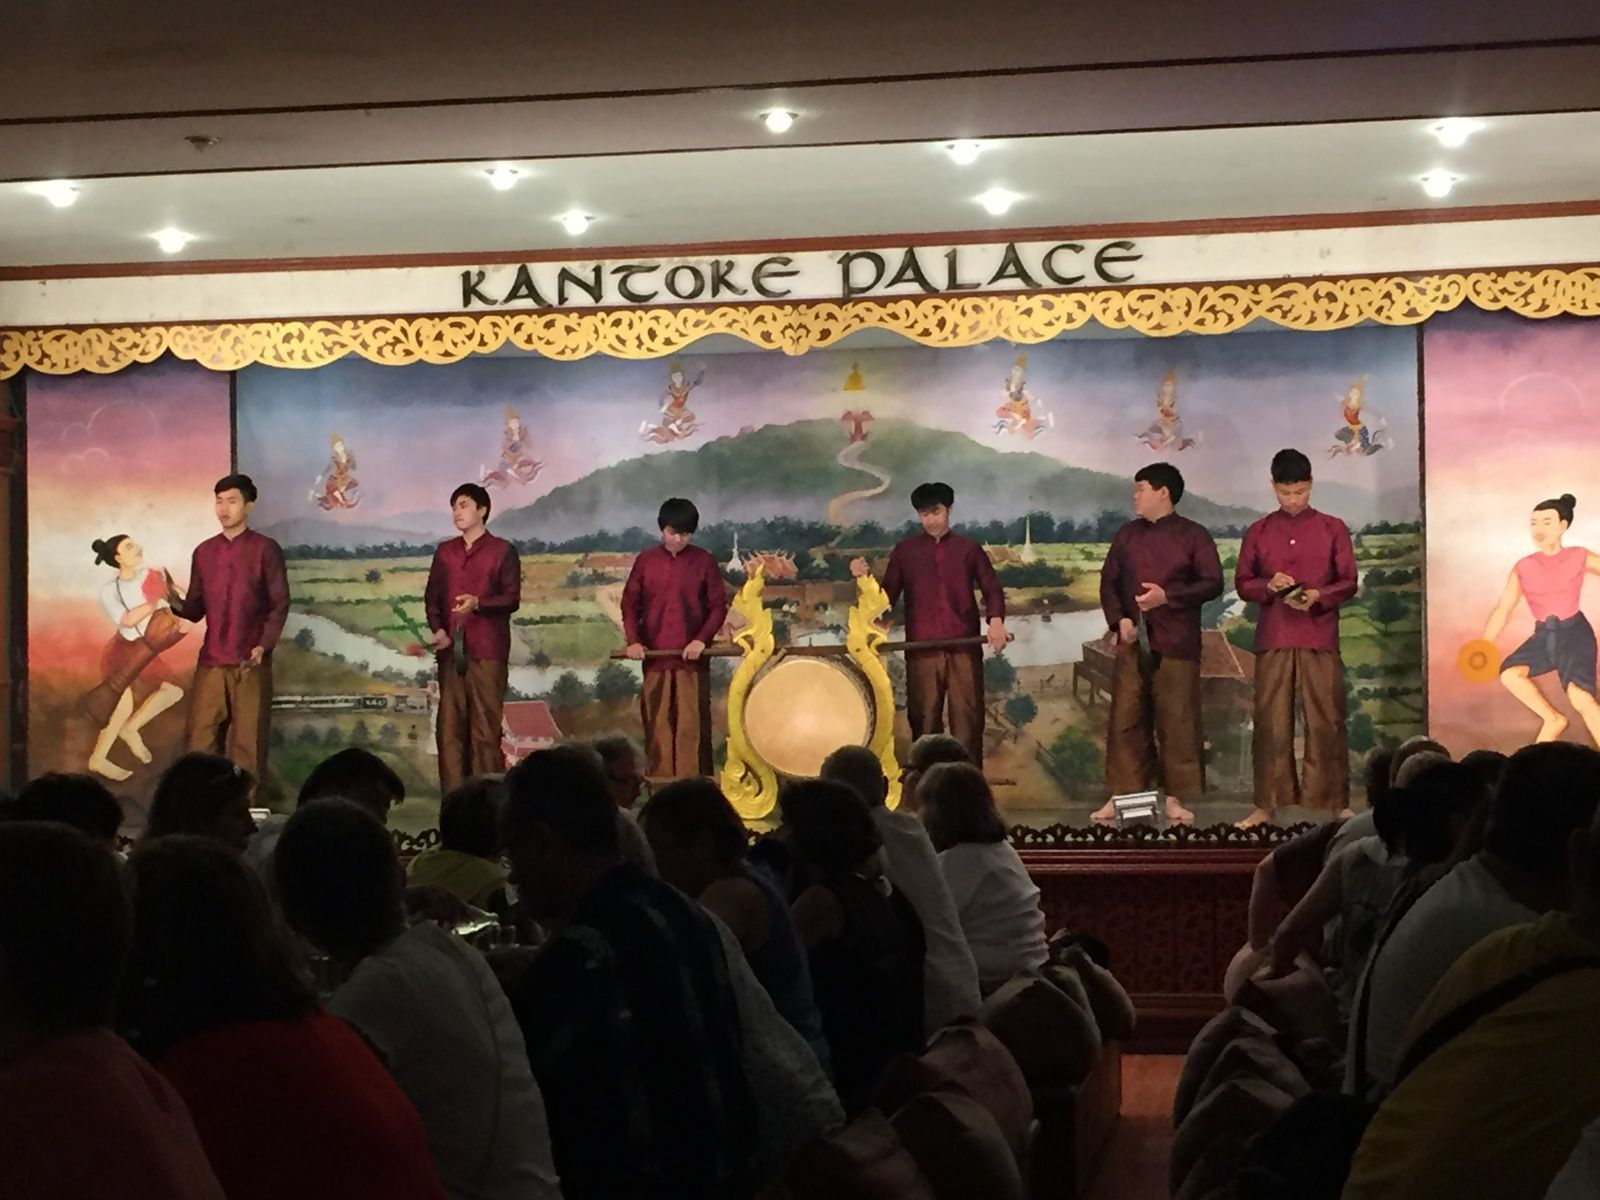 ALBUM PHOTO DU VOYAGES EN THAILLANDE MARS 2016